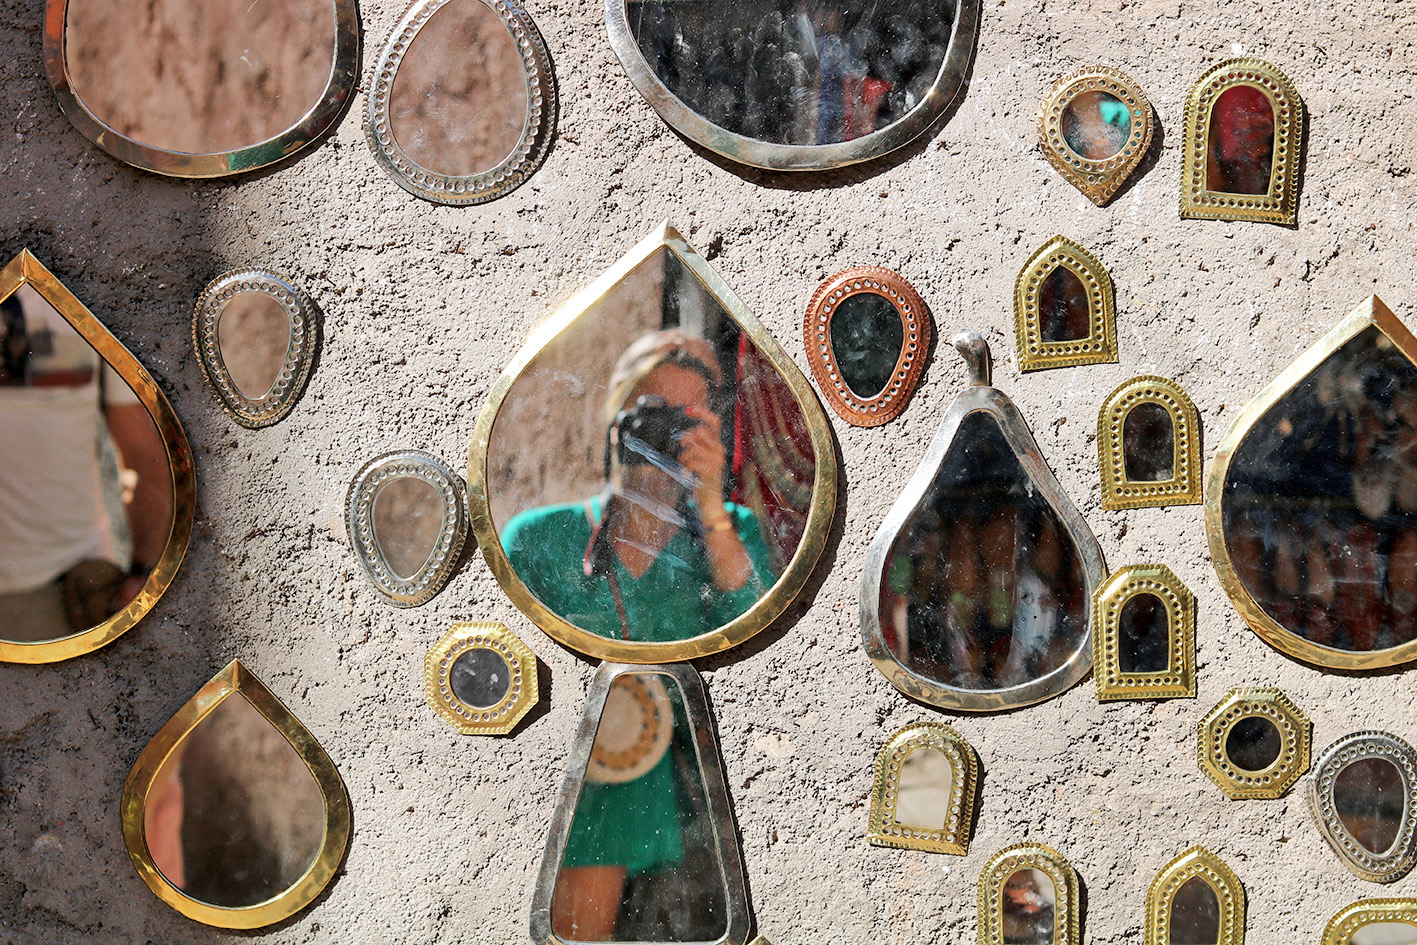 petit-miroir-metal-frappe-marocain